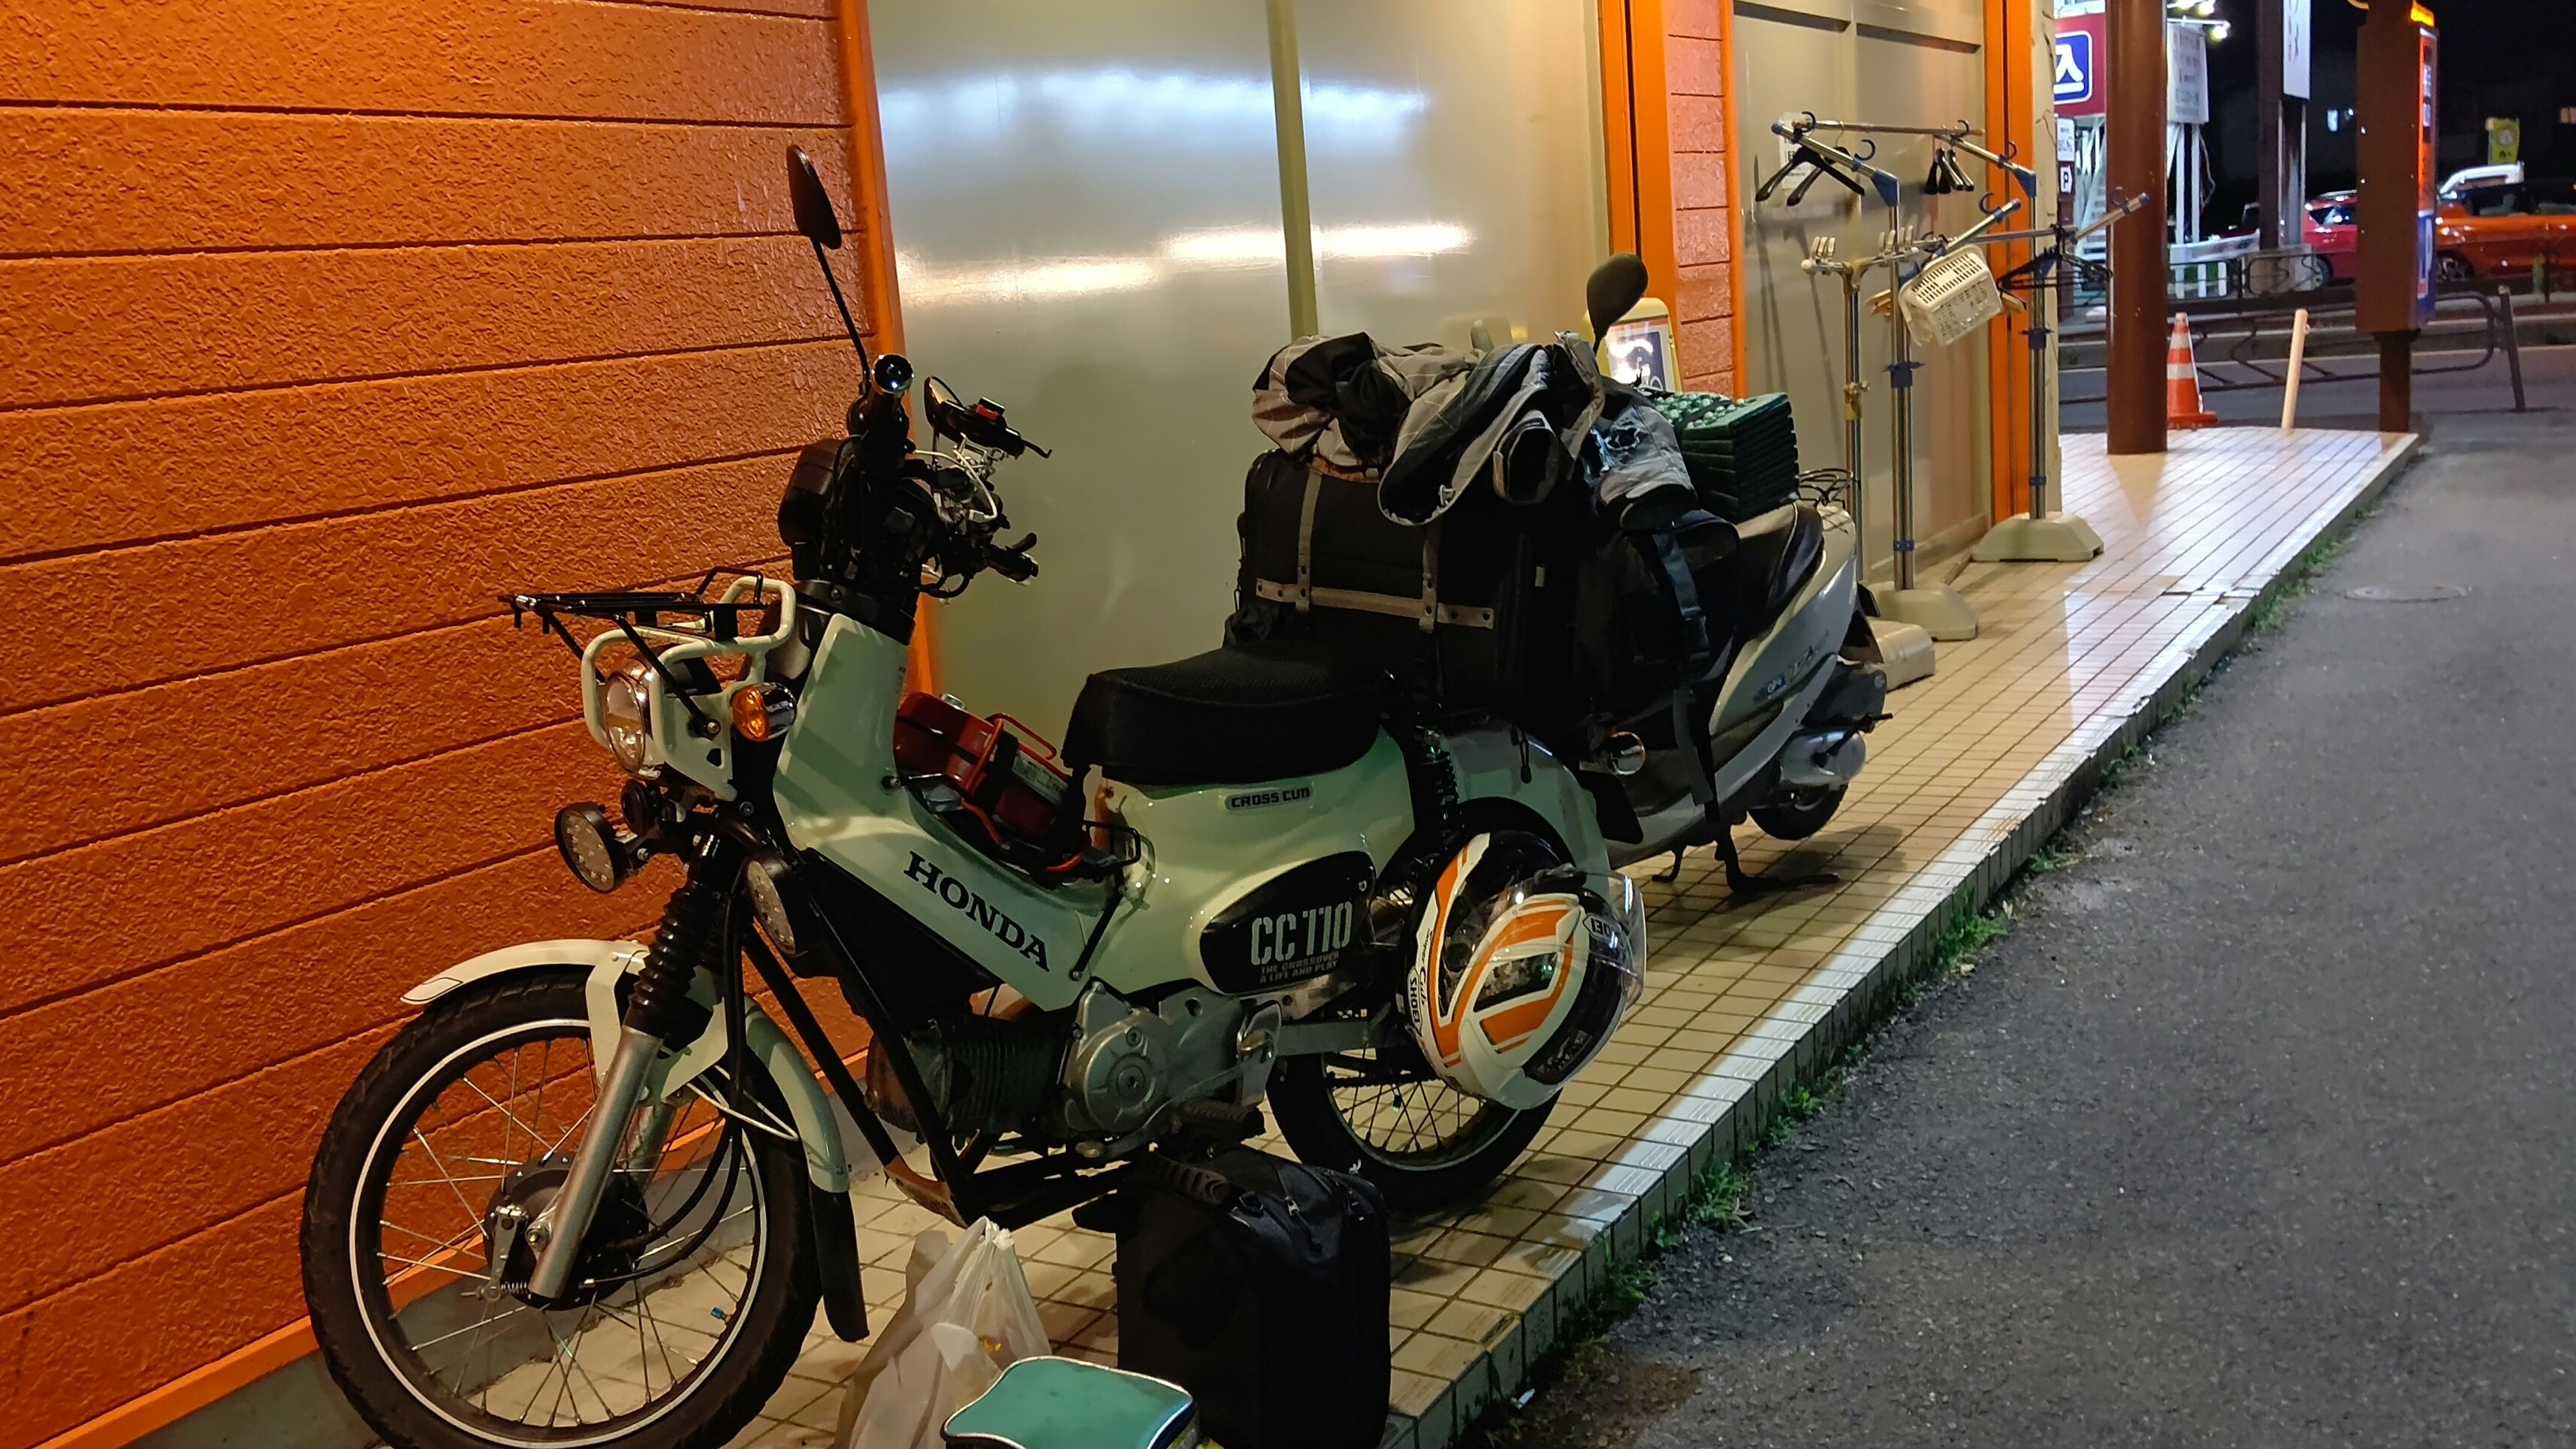 f:id:Tsubasaba:20210703233121j:image